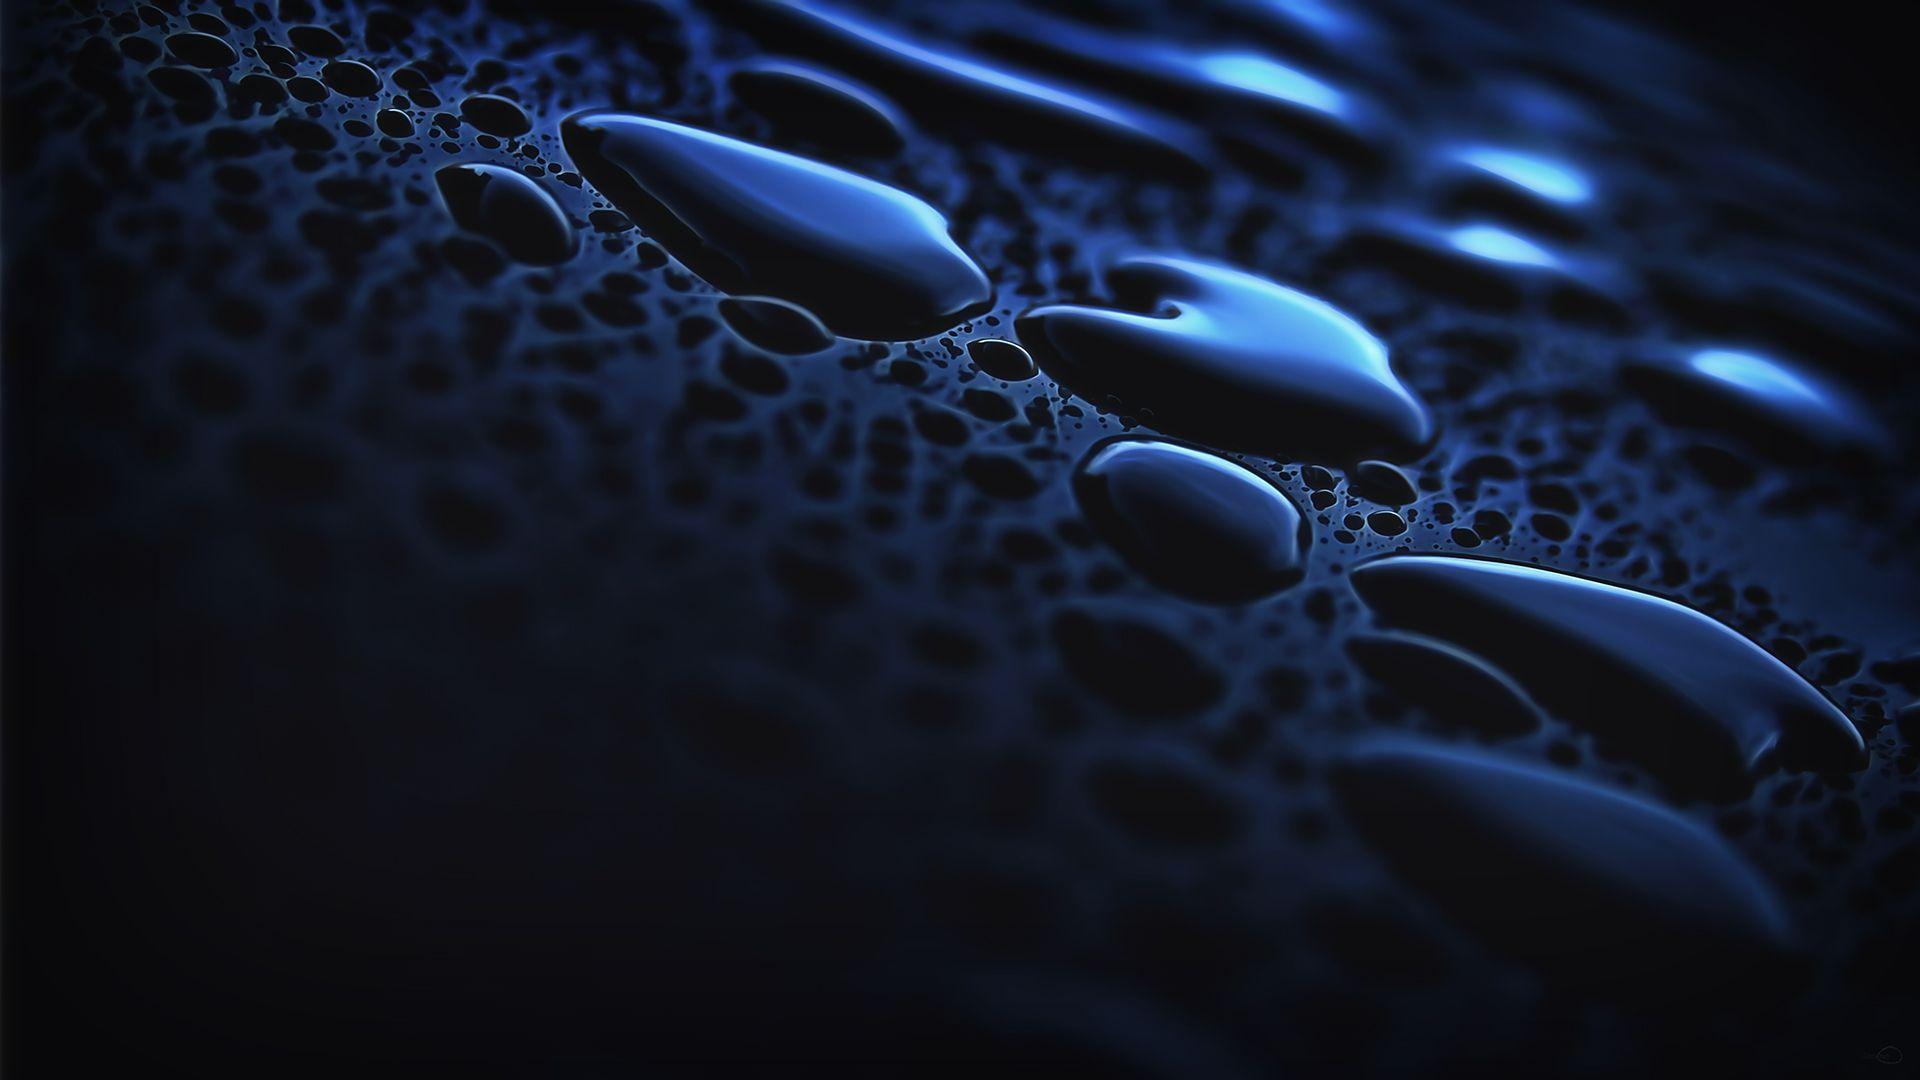 Dark Blue Wallpapers - Wallpaper Cave